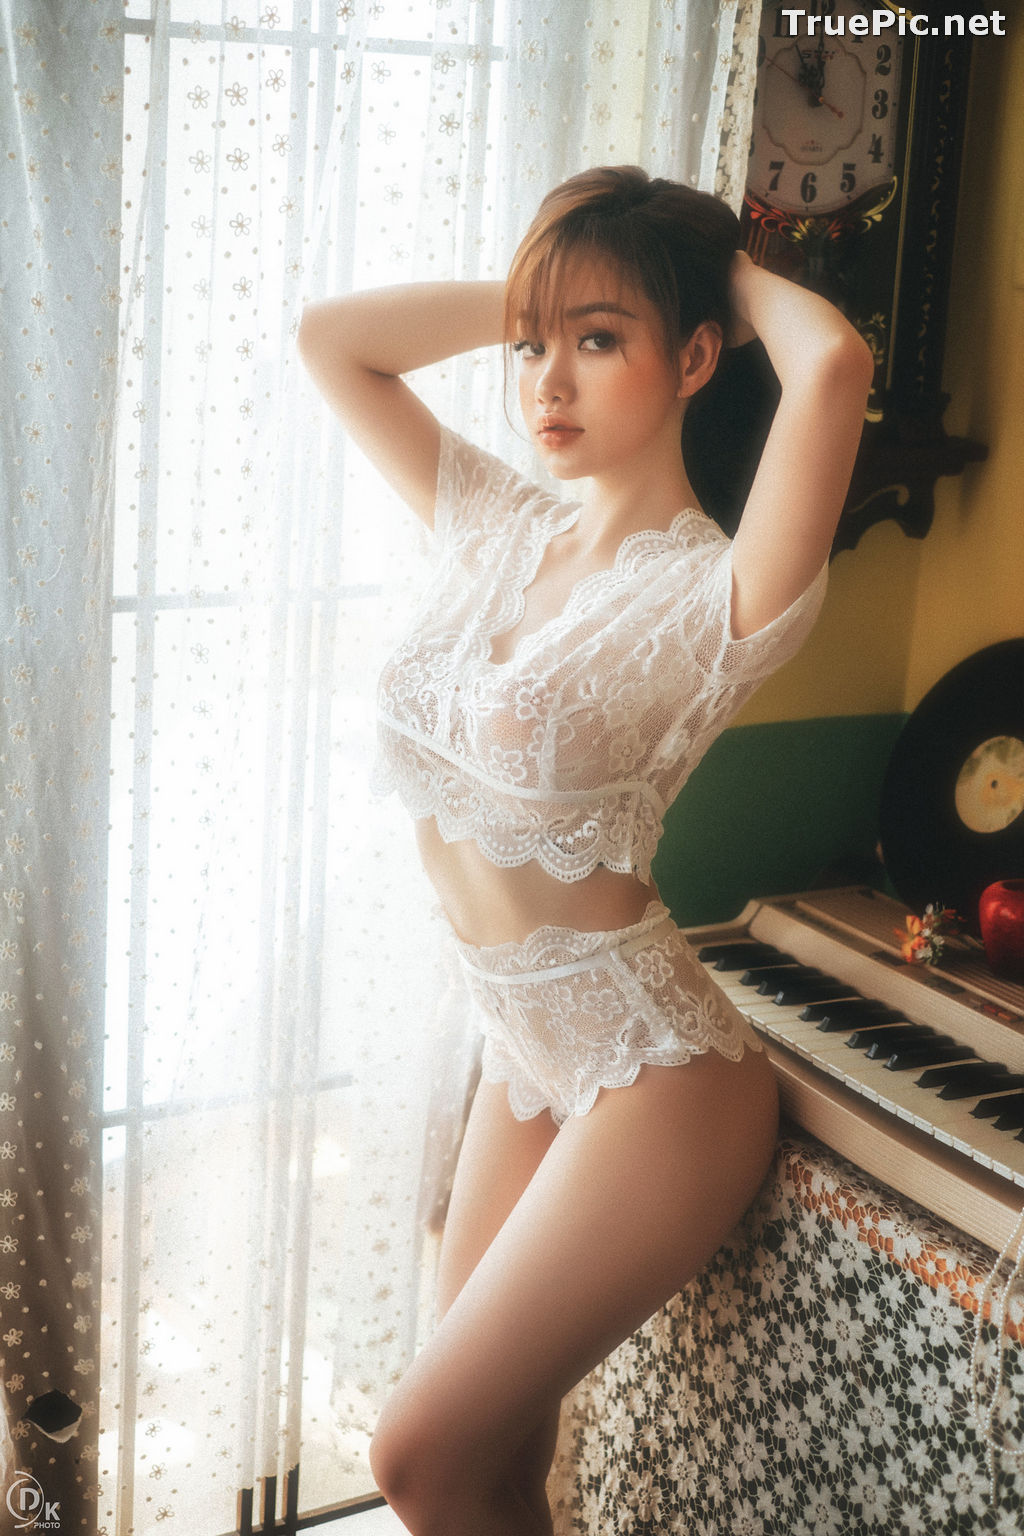 Image Vietnamese Hot Model - Sleepwear and Lingerie Under Dawnlight - TruePic.net - Picture-5